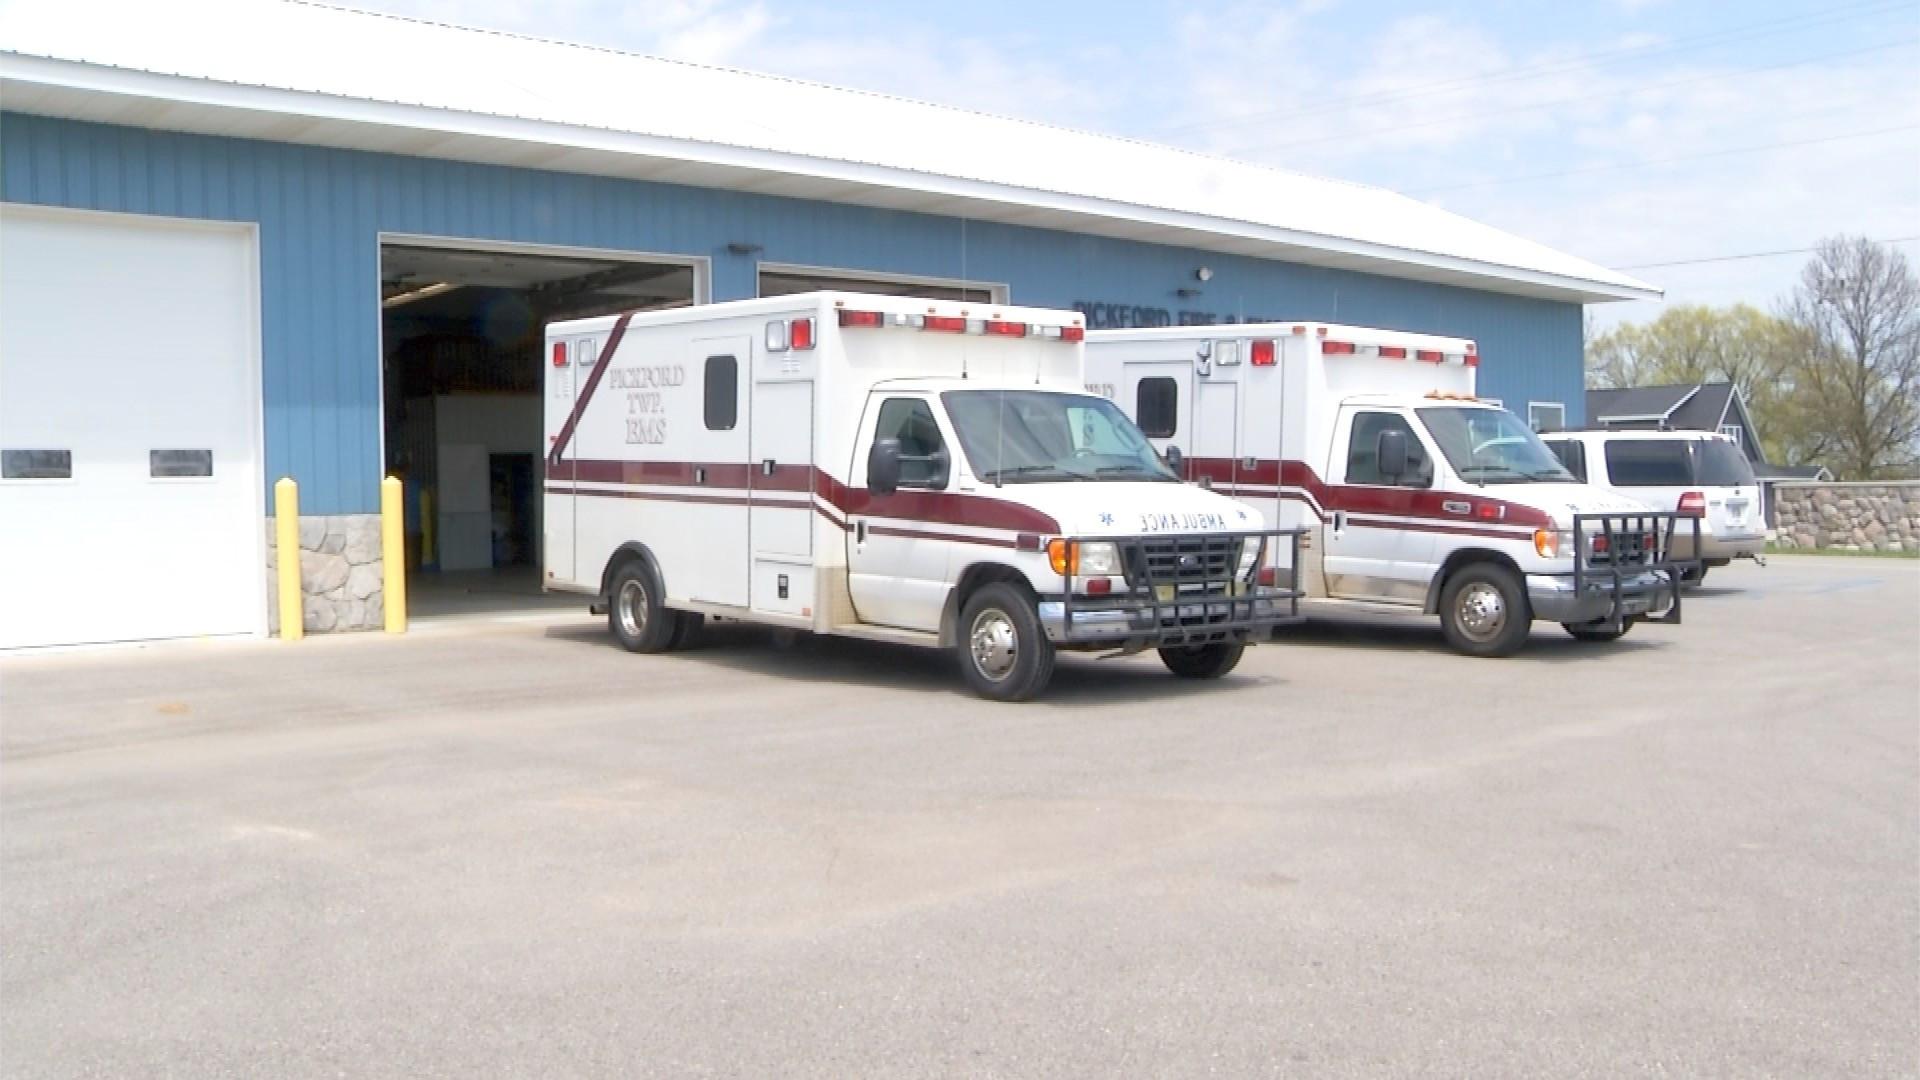 Pickford EMT Clinical